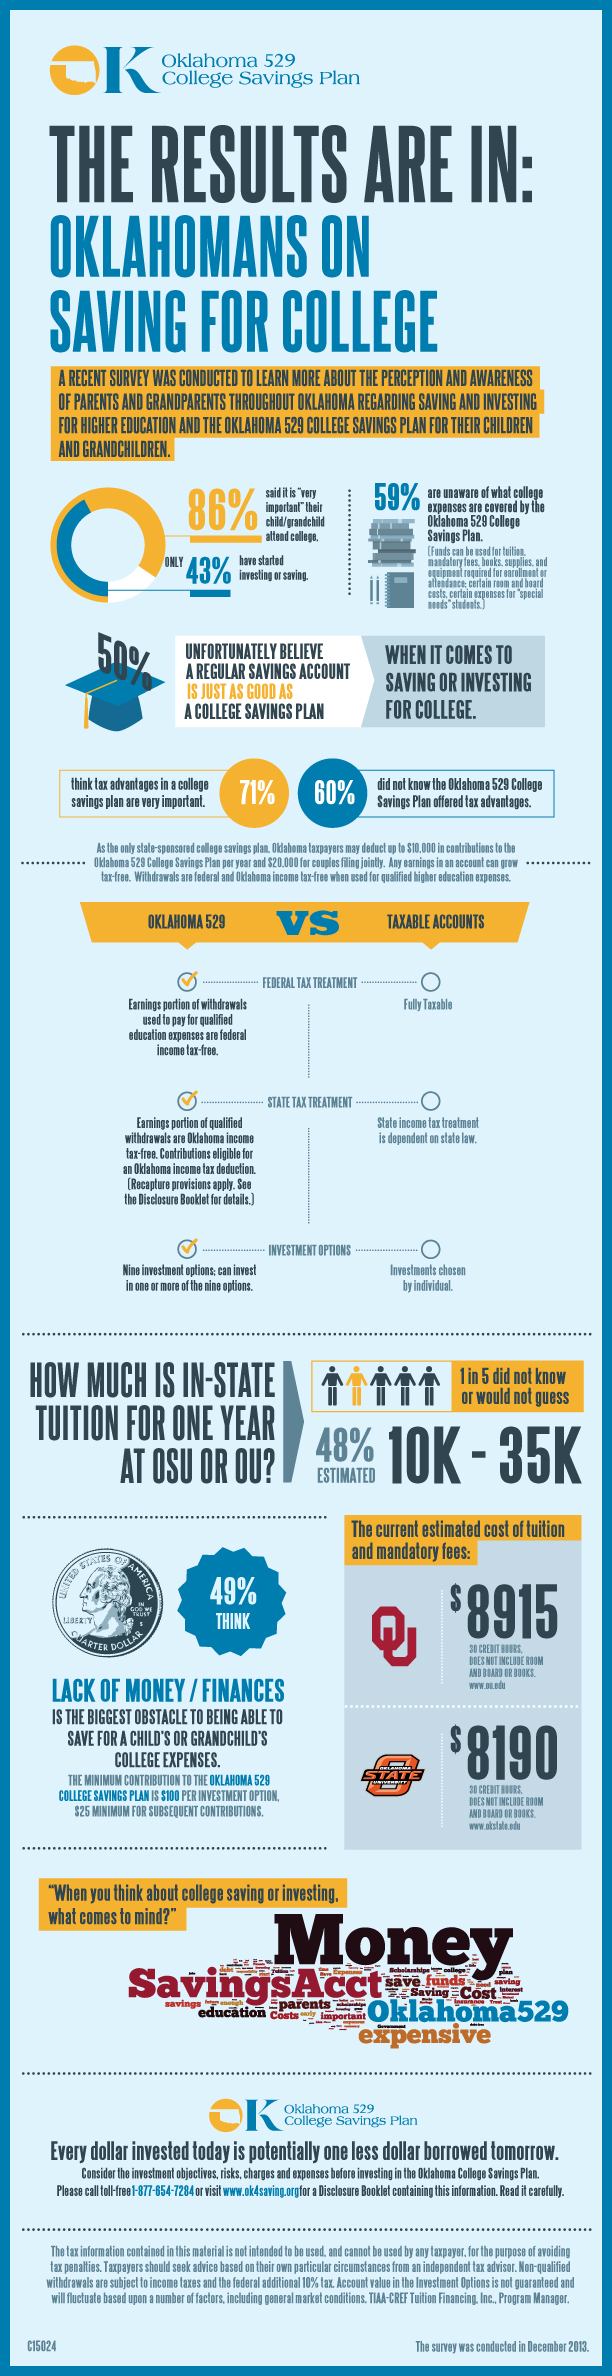 OCSP-Infographic-Vertical-Web-02-27-2014